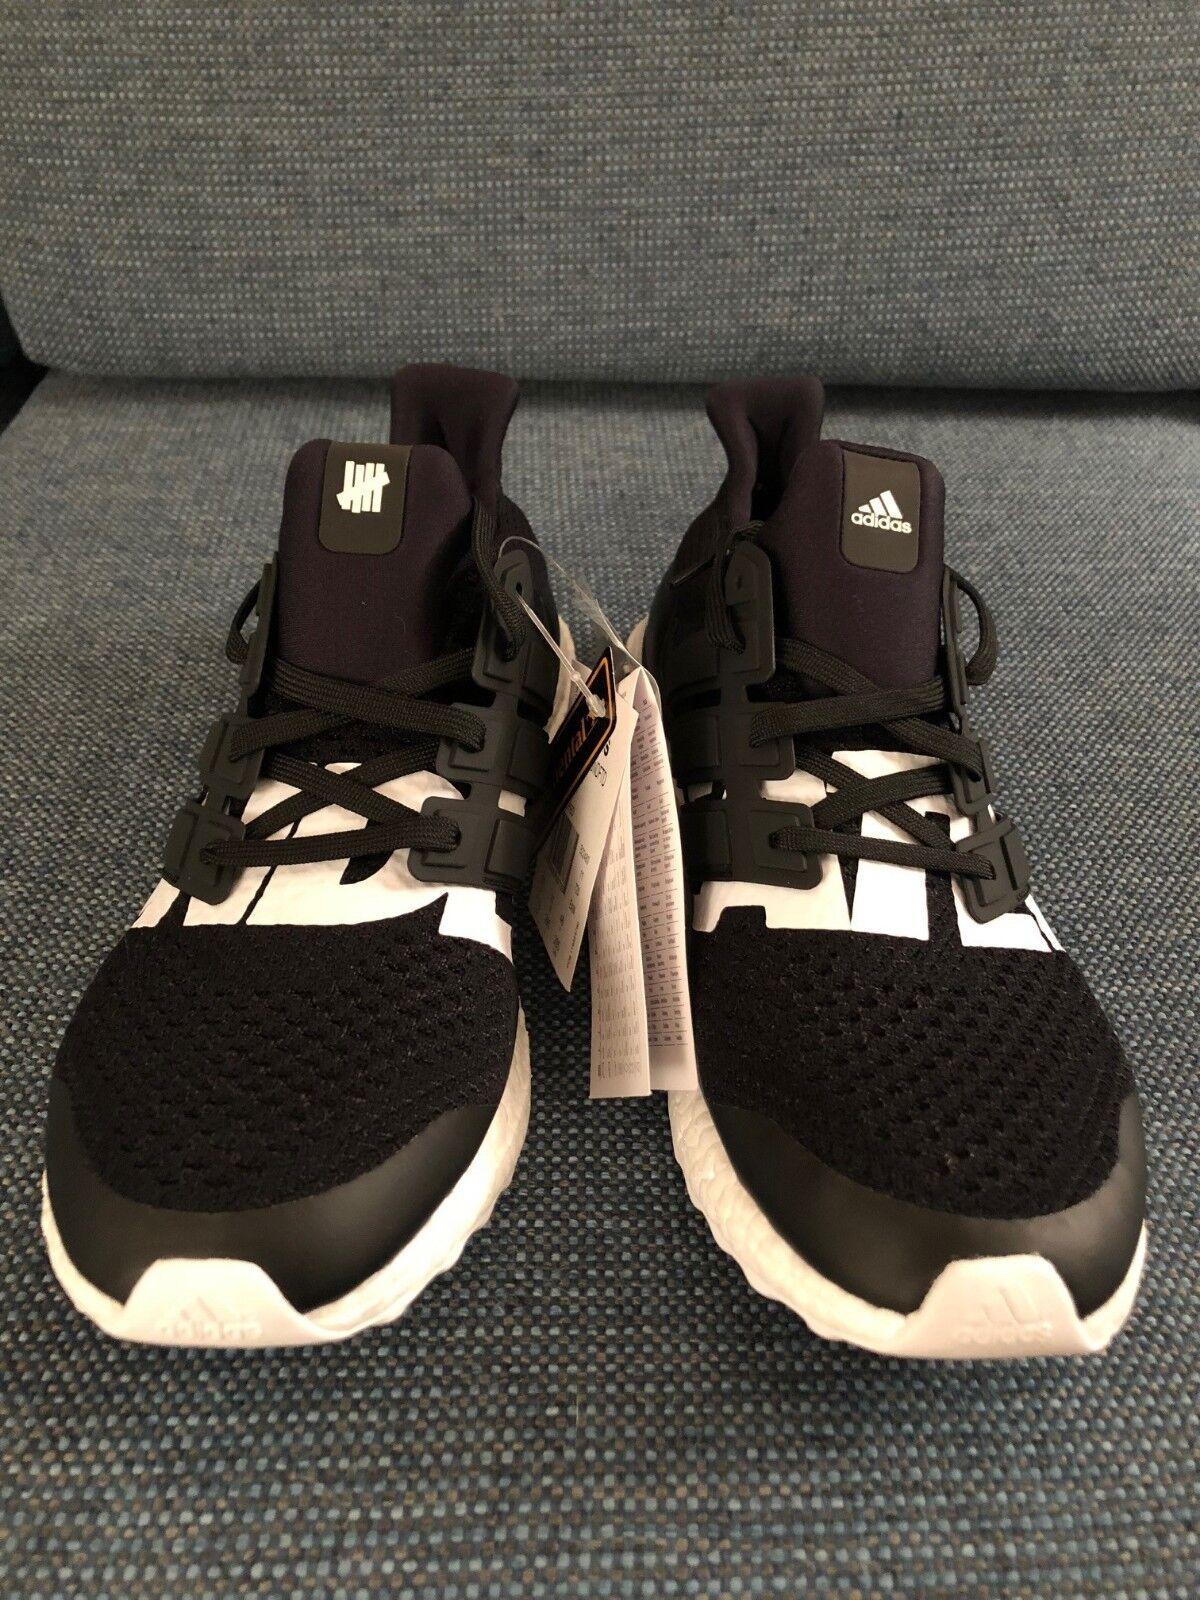 Adidas Ultra Boost 1.0 UNDFTD Black Style B22480 Size 11.5